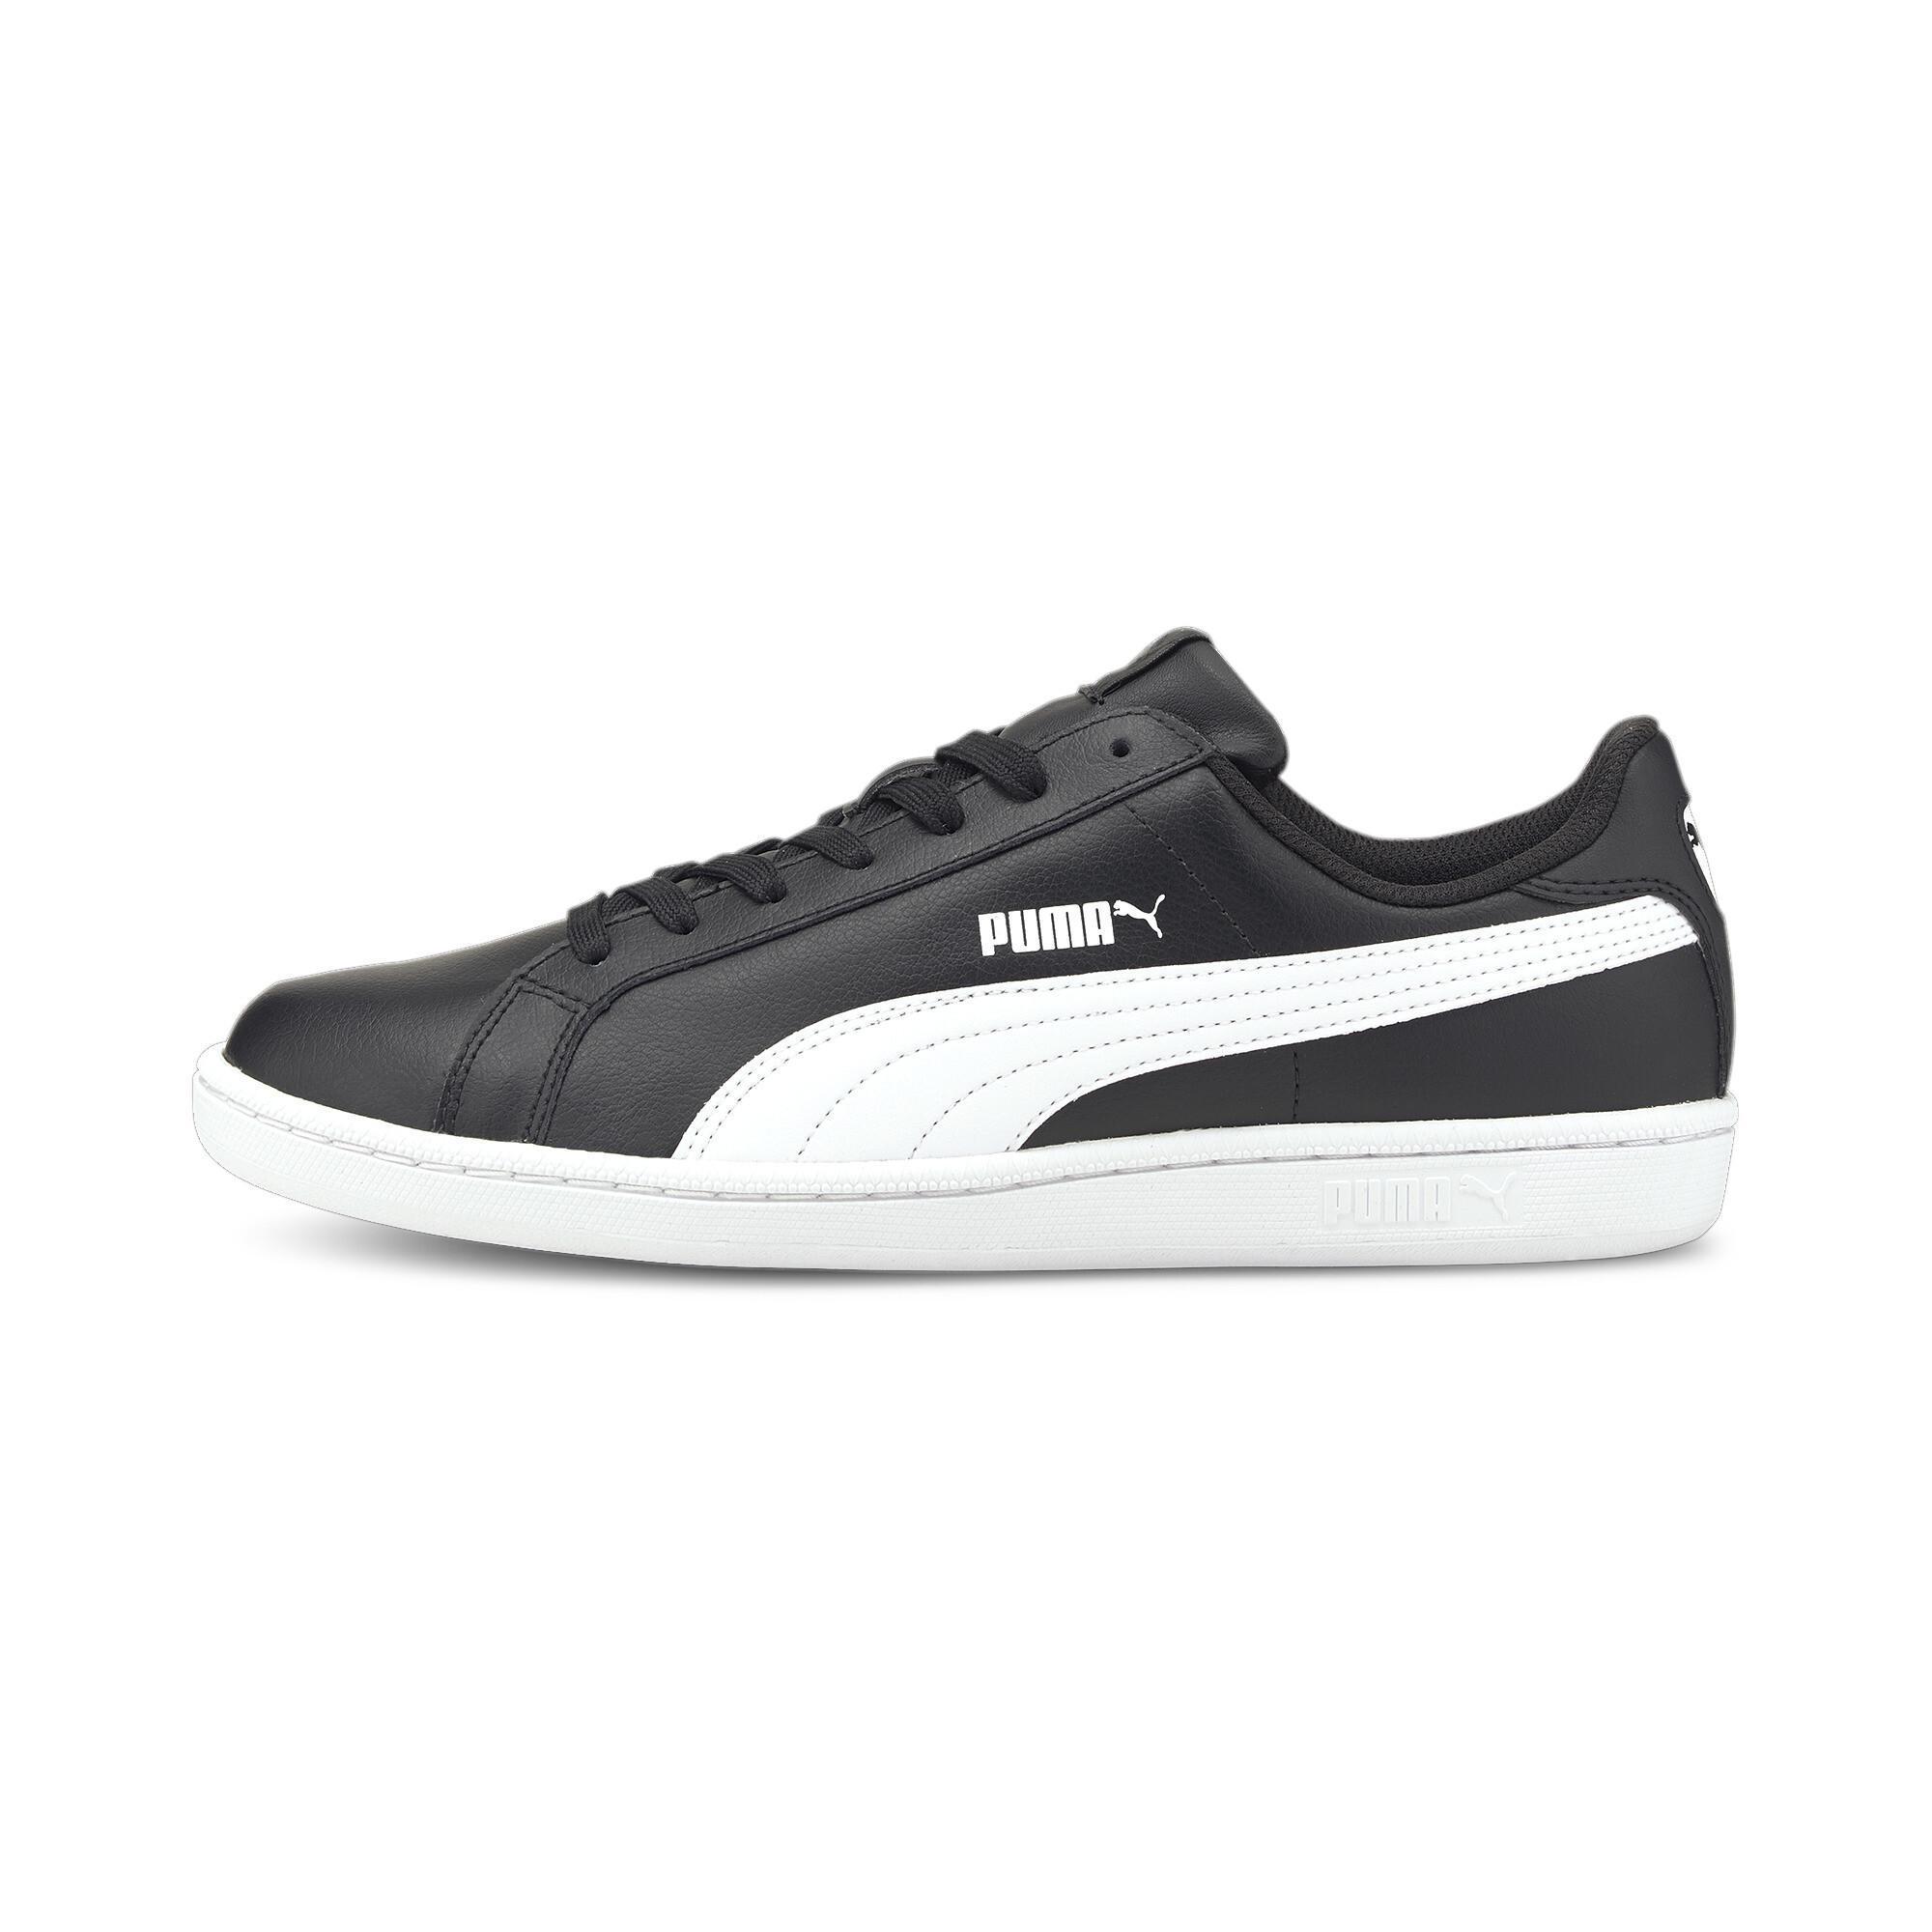 Indexbild 24 - PUMA Smash Trainers Schuhe Sneakers Sport Classics Unisex Neu